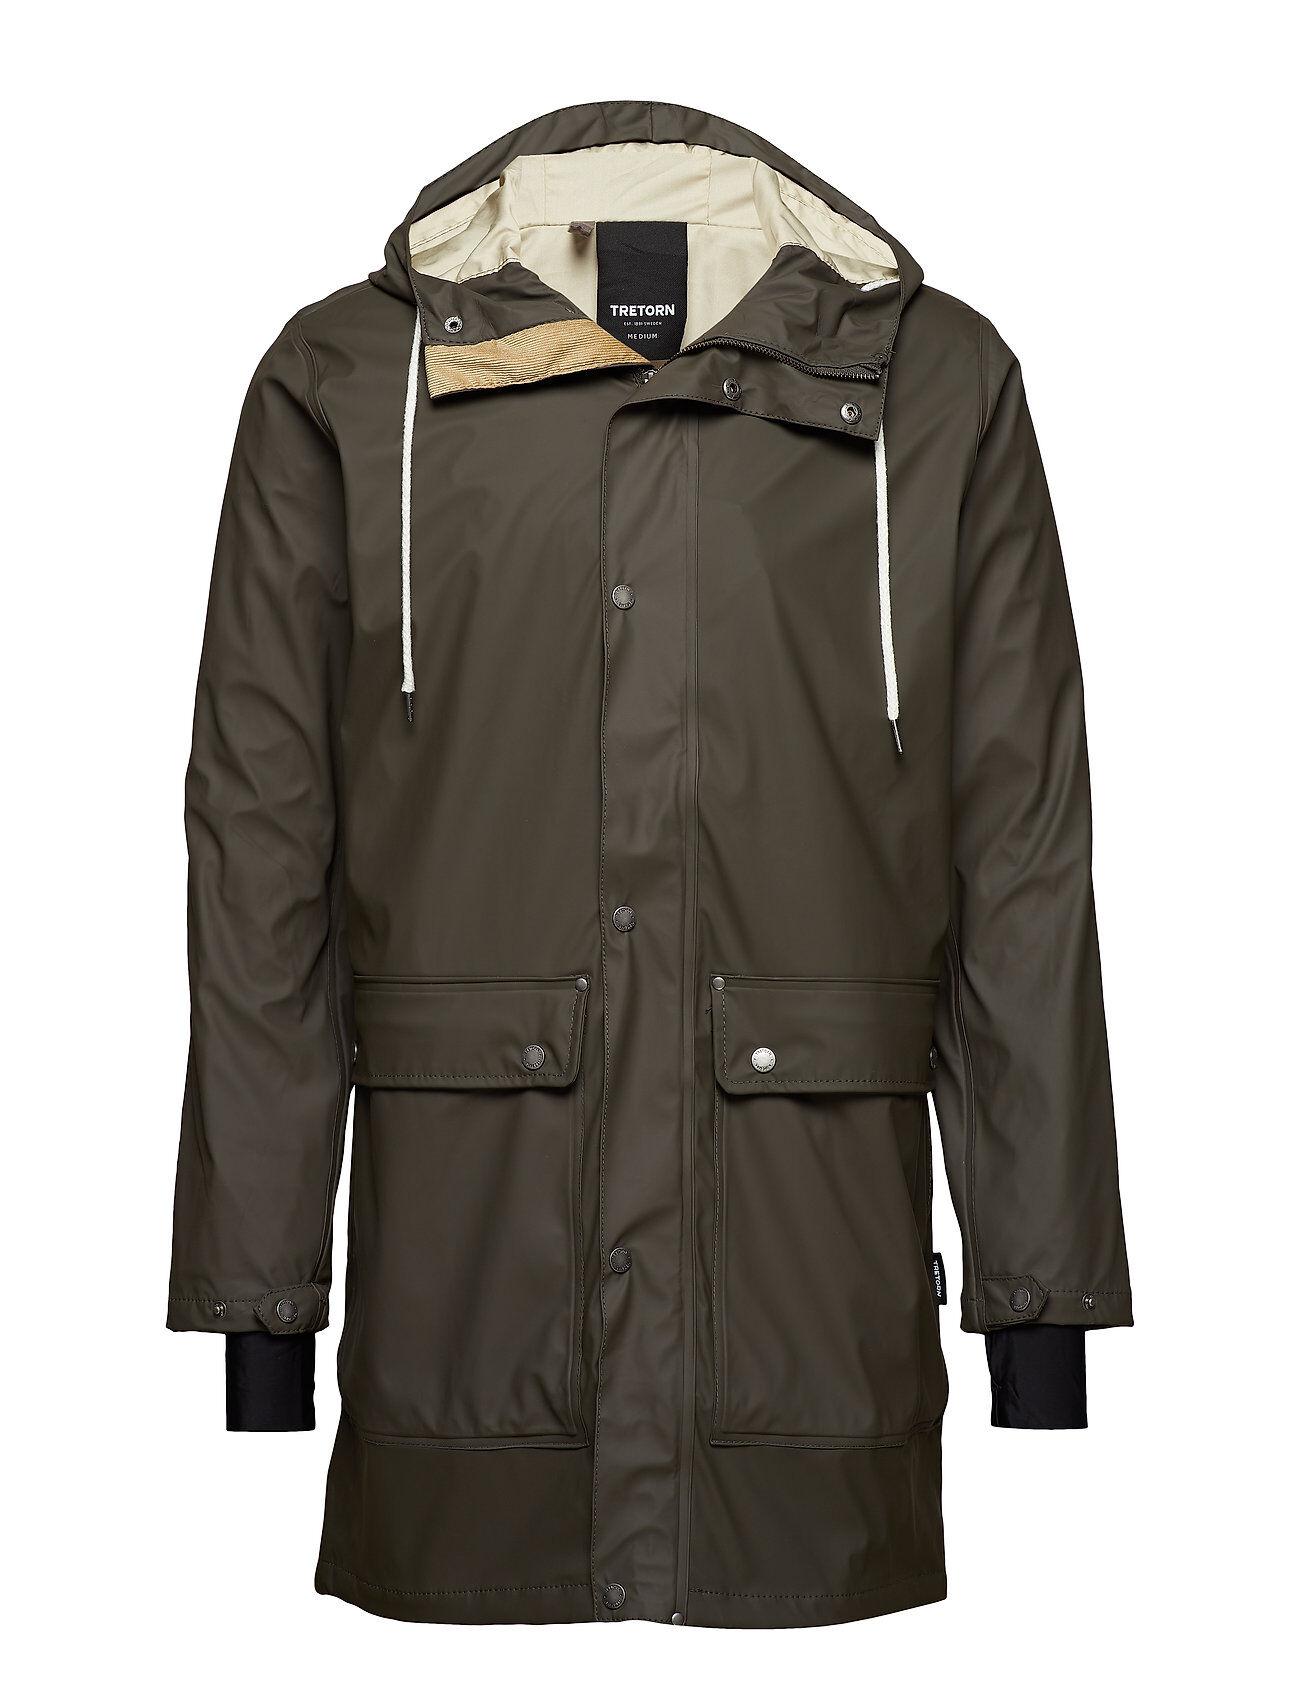 Tretorn Evald 2.0 Raincoat